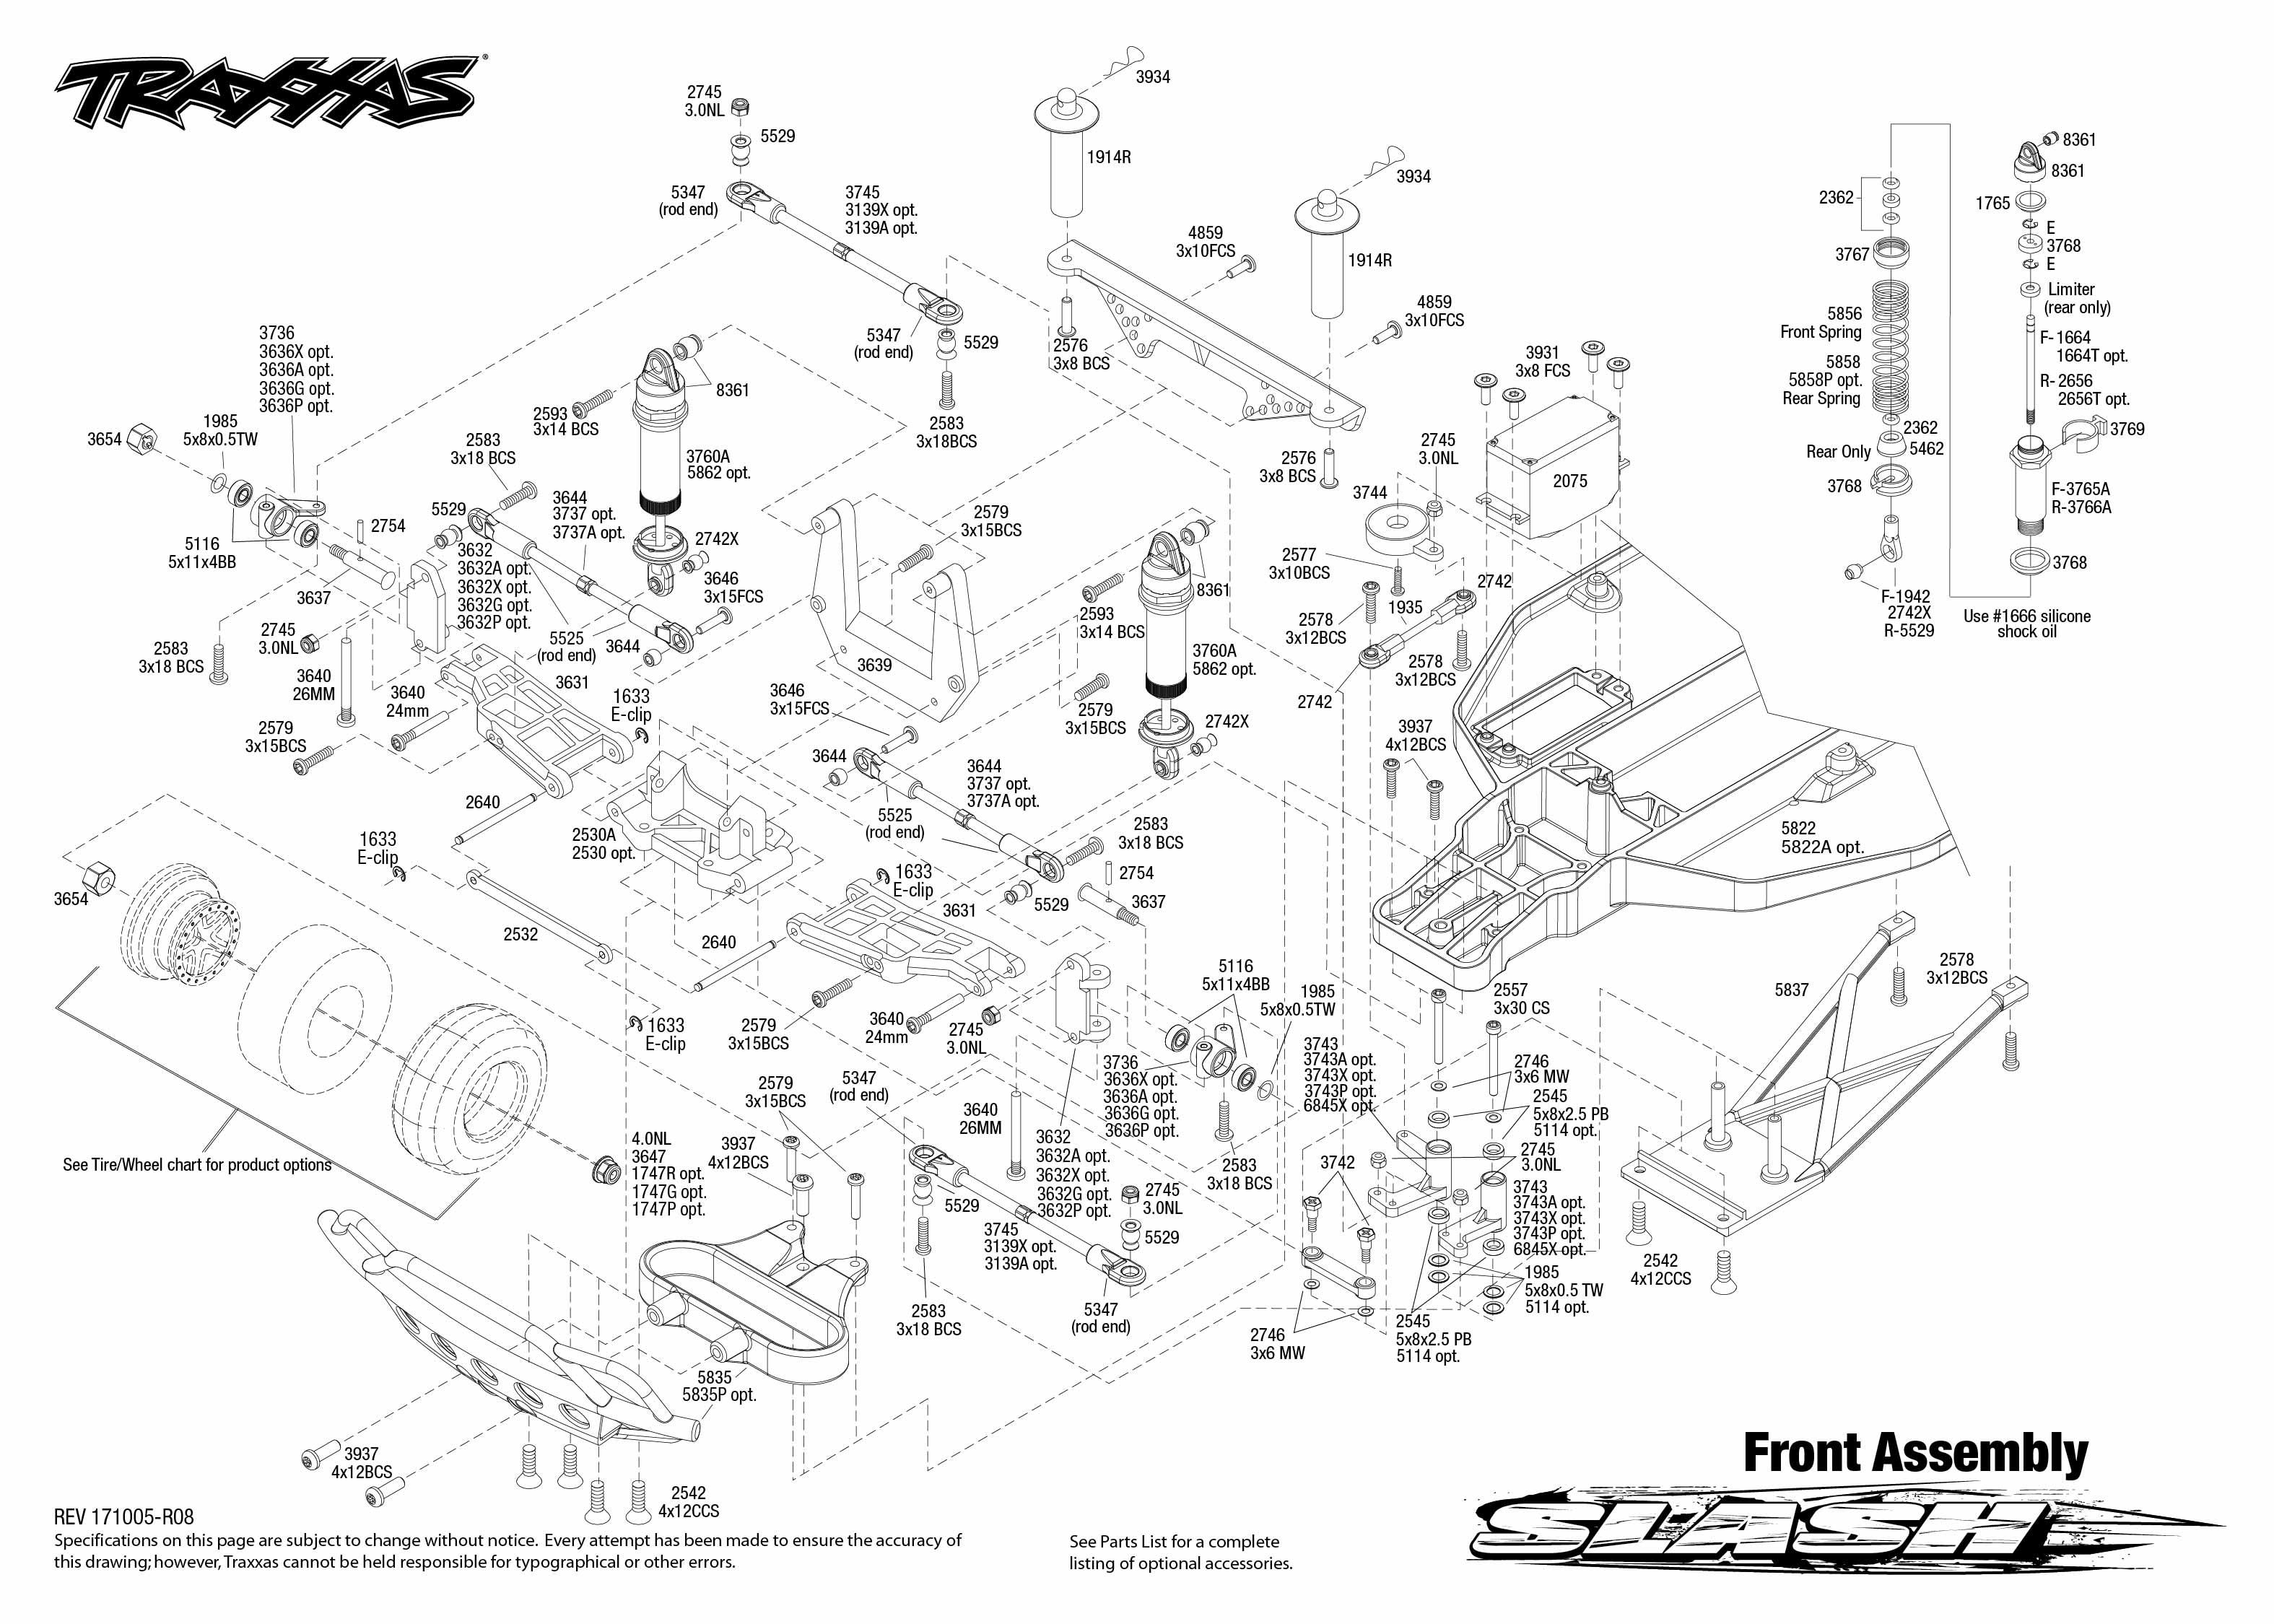 Traxxas Slash 1/10-Scale 2WD Short Course Racing Truck